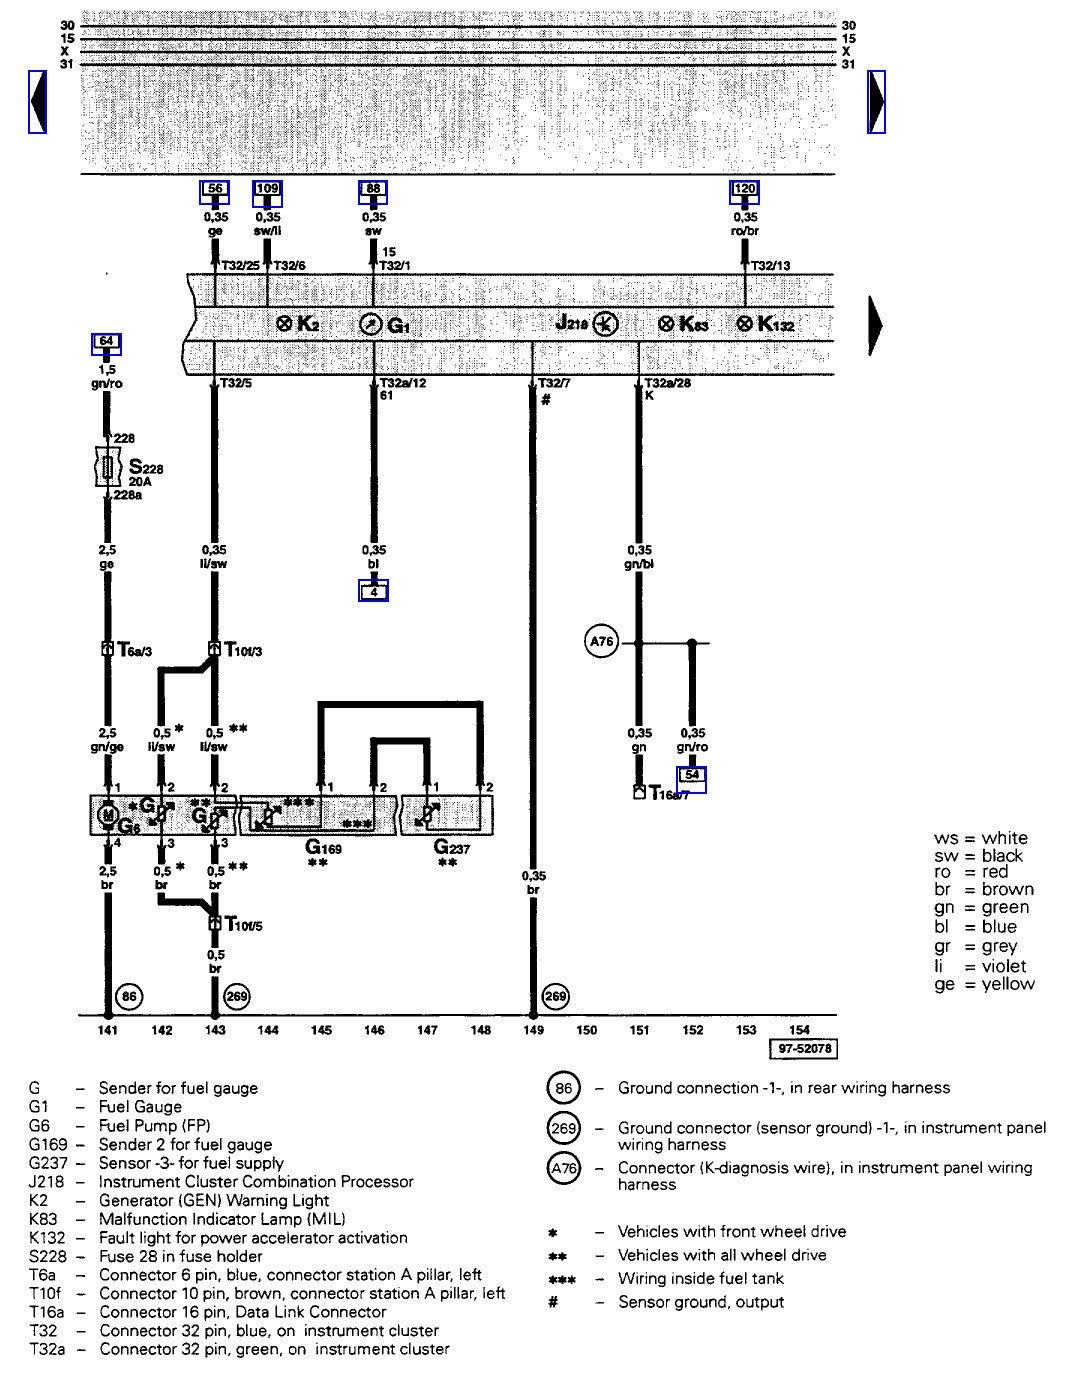 medium resolution of audi tt headlight wiring diagram wiring schematics diagram rh enr audi tt headlight wiring diagram audi tt headlight wiring diagram